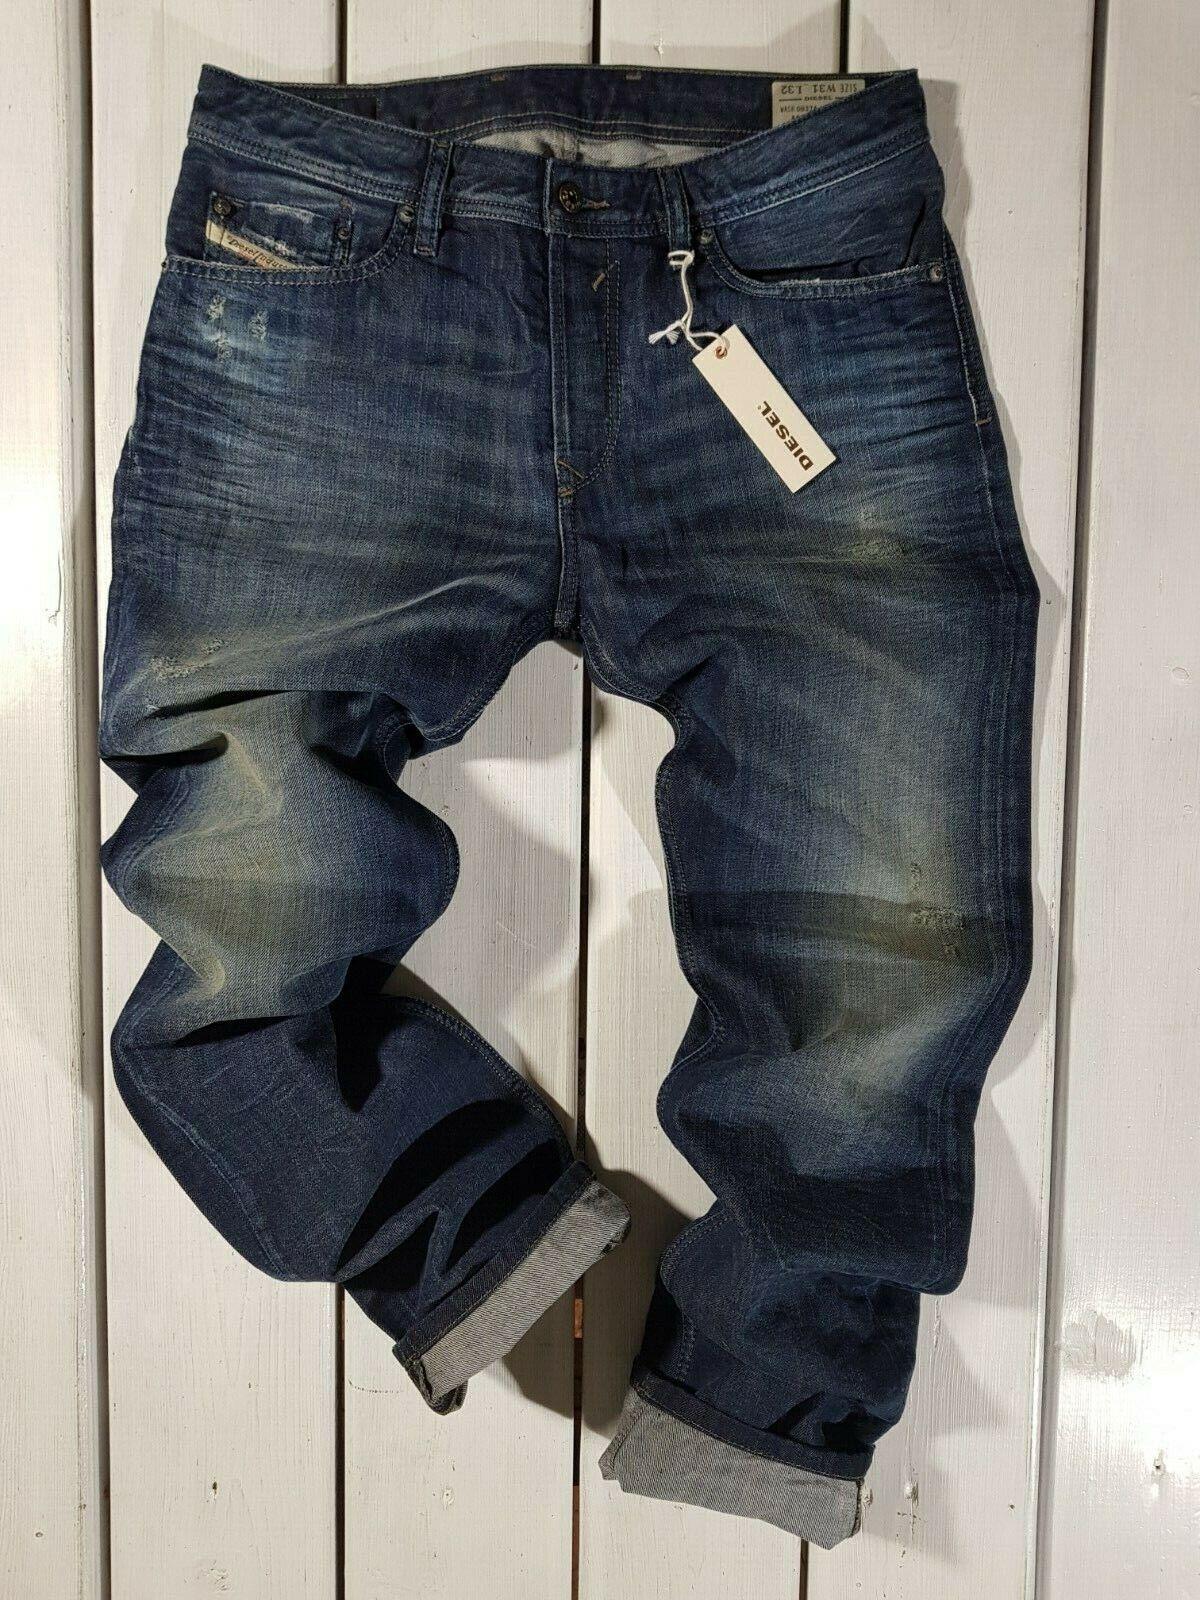 New Diesel Men's Jeans Waykee 0837A Regular Straight Stonwashed bluee RRP